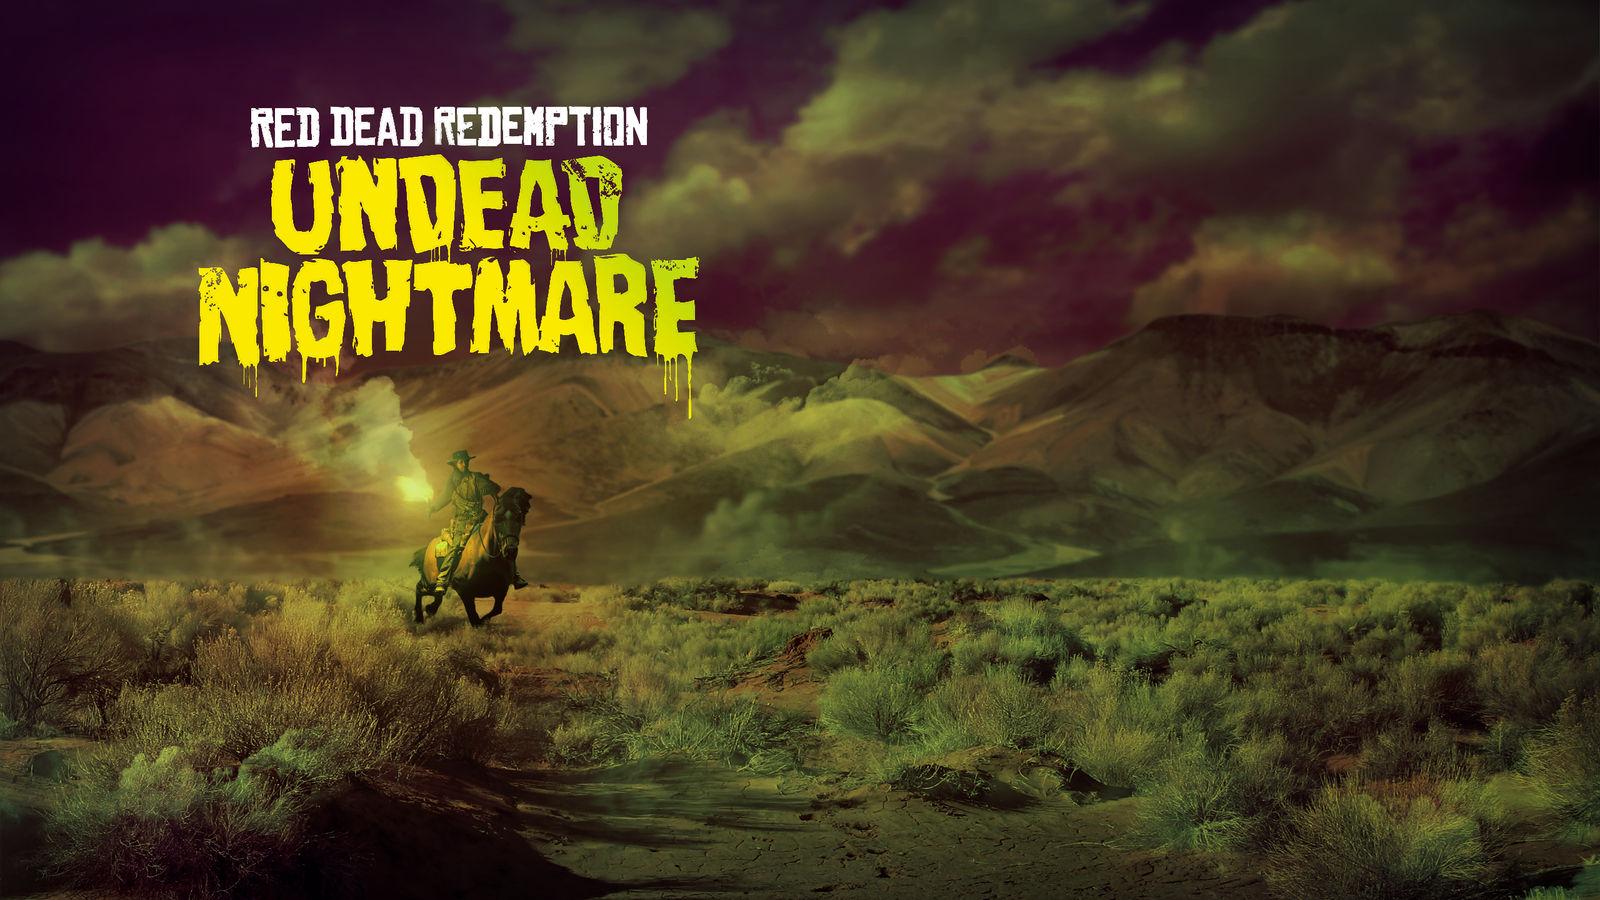 Red Dead Redemption Undead Nightmare By Couiche On Deviantart